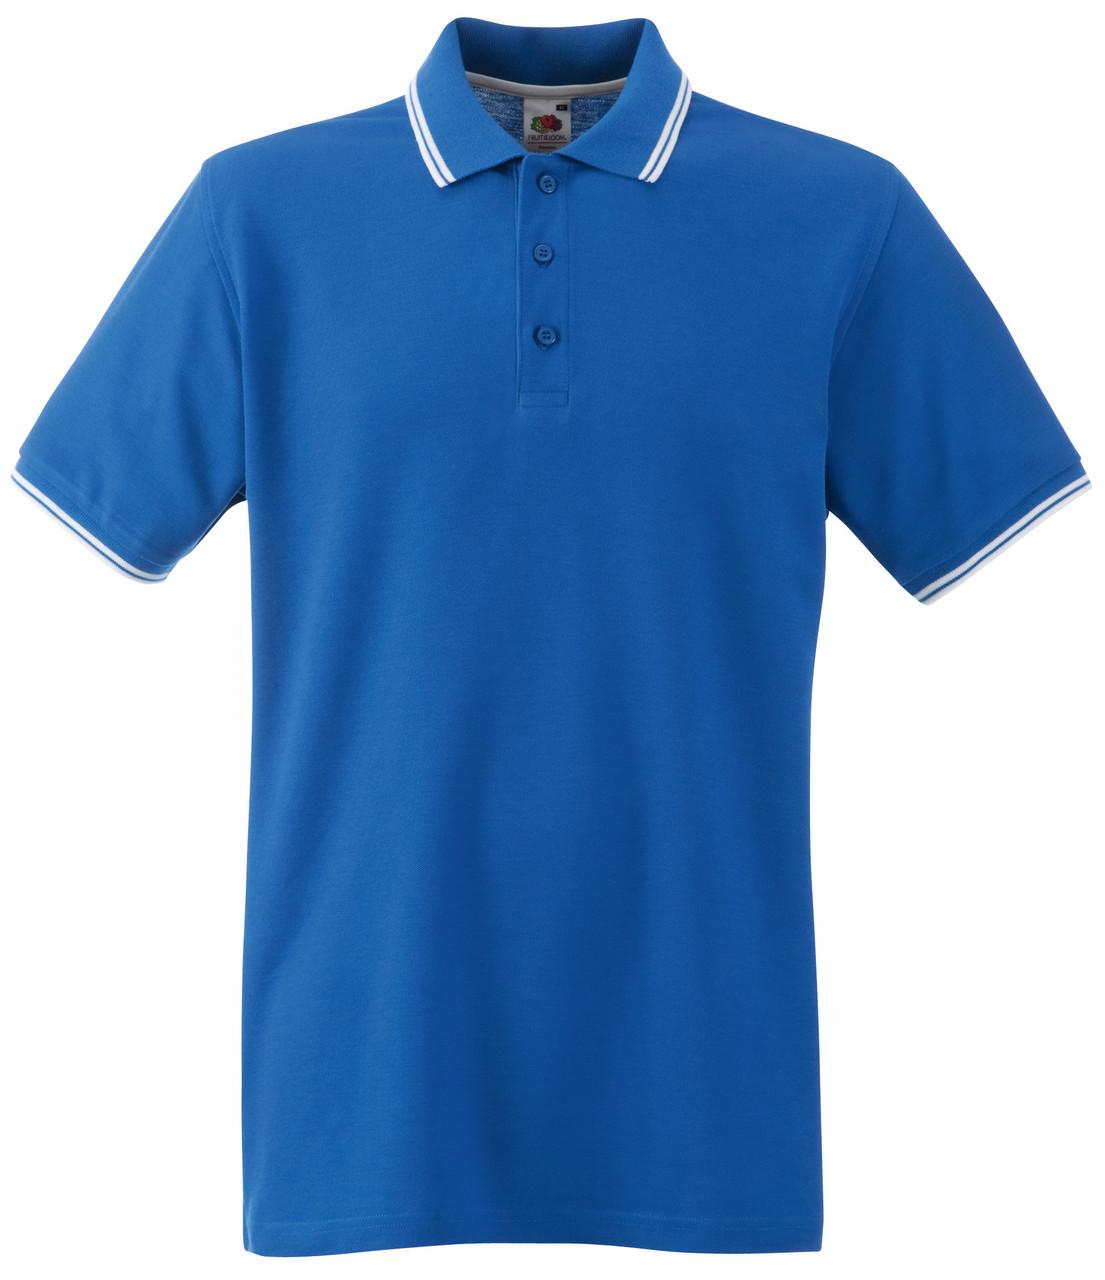 Мужское Поло Ярко-синее с Белыми Полосками Fruit of the loom 63-032-Kb Xl